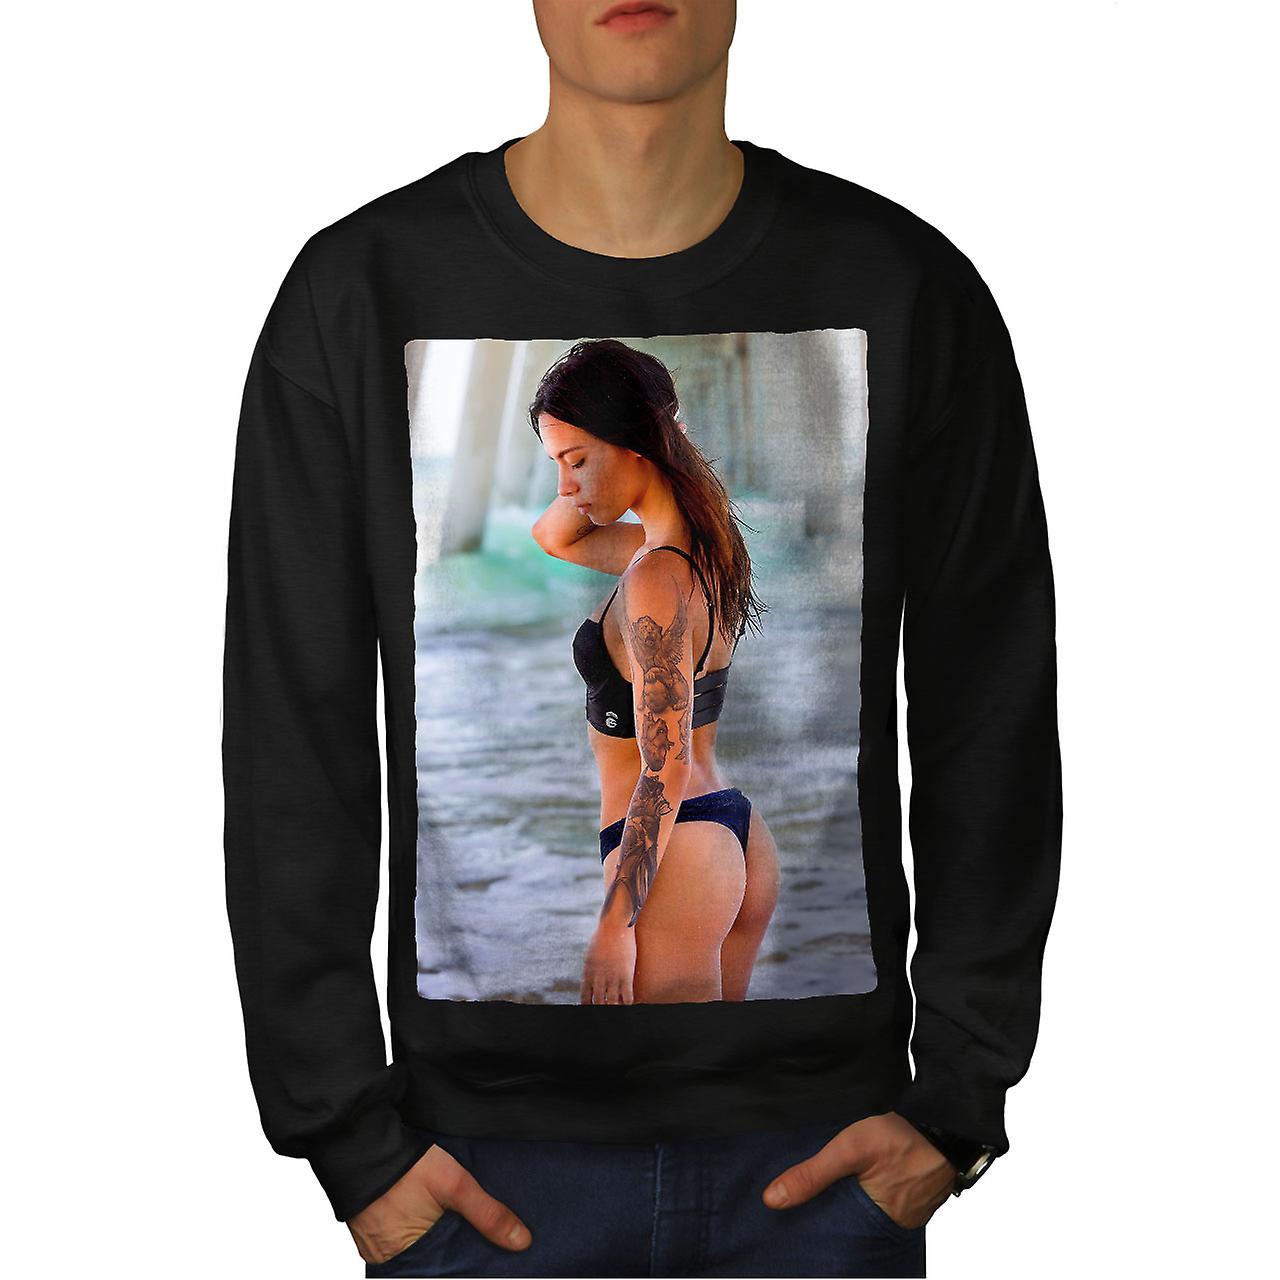 Femme en maillot de bain hommes noirSweatshirt